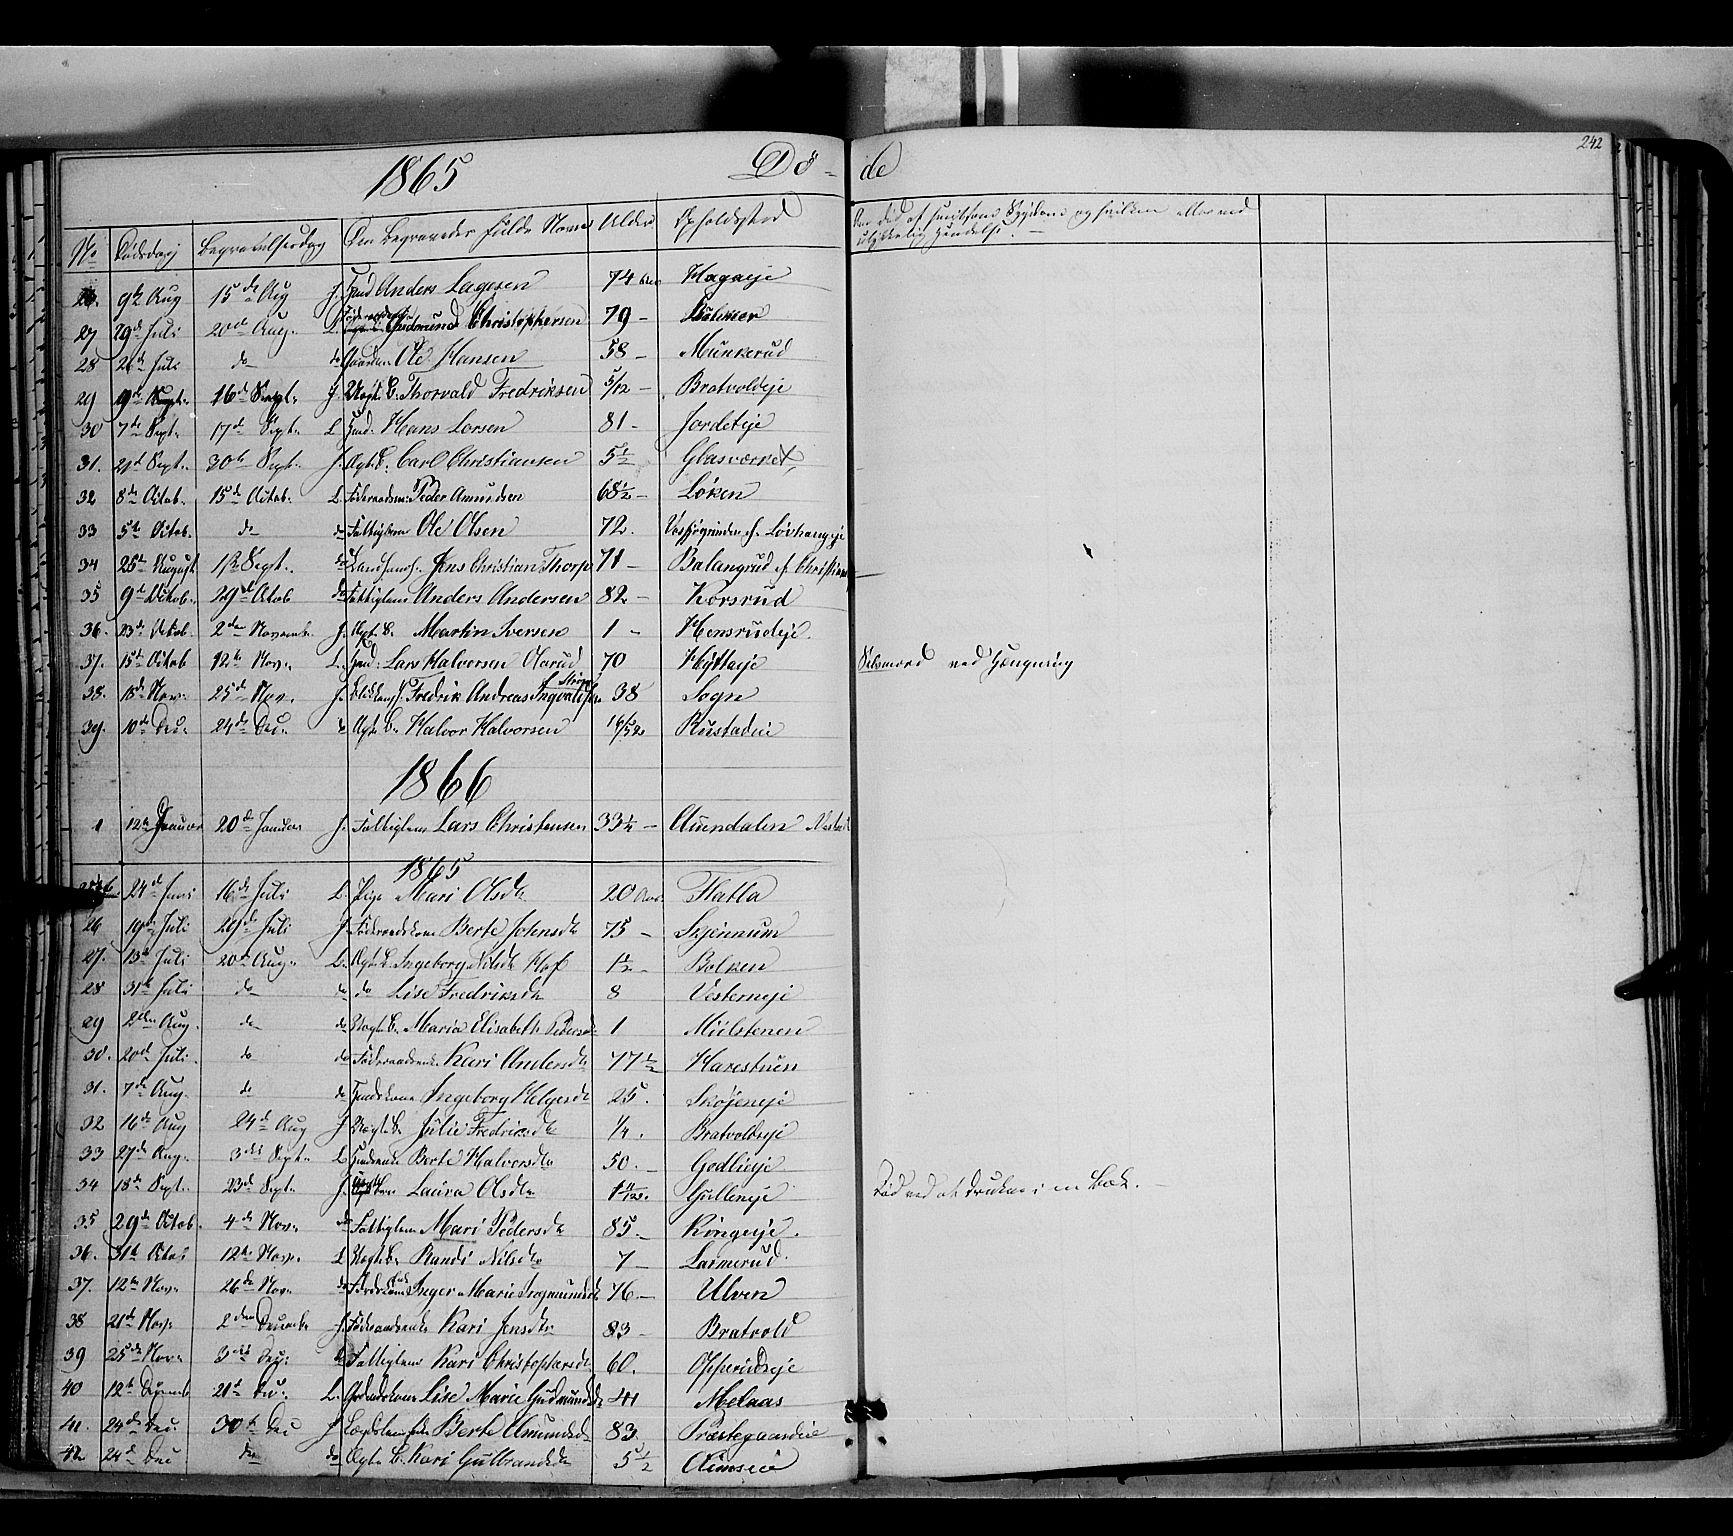 SAH, Jevnaker prestekontor, Ministerialbok nr. 7, 1858-1876, s. 242